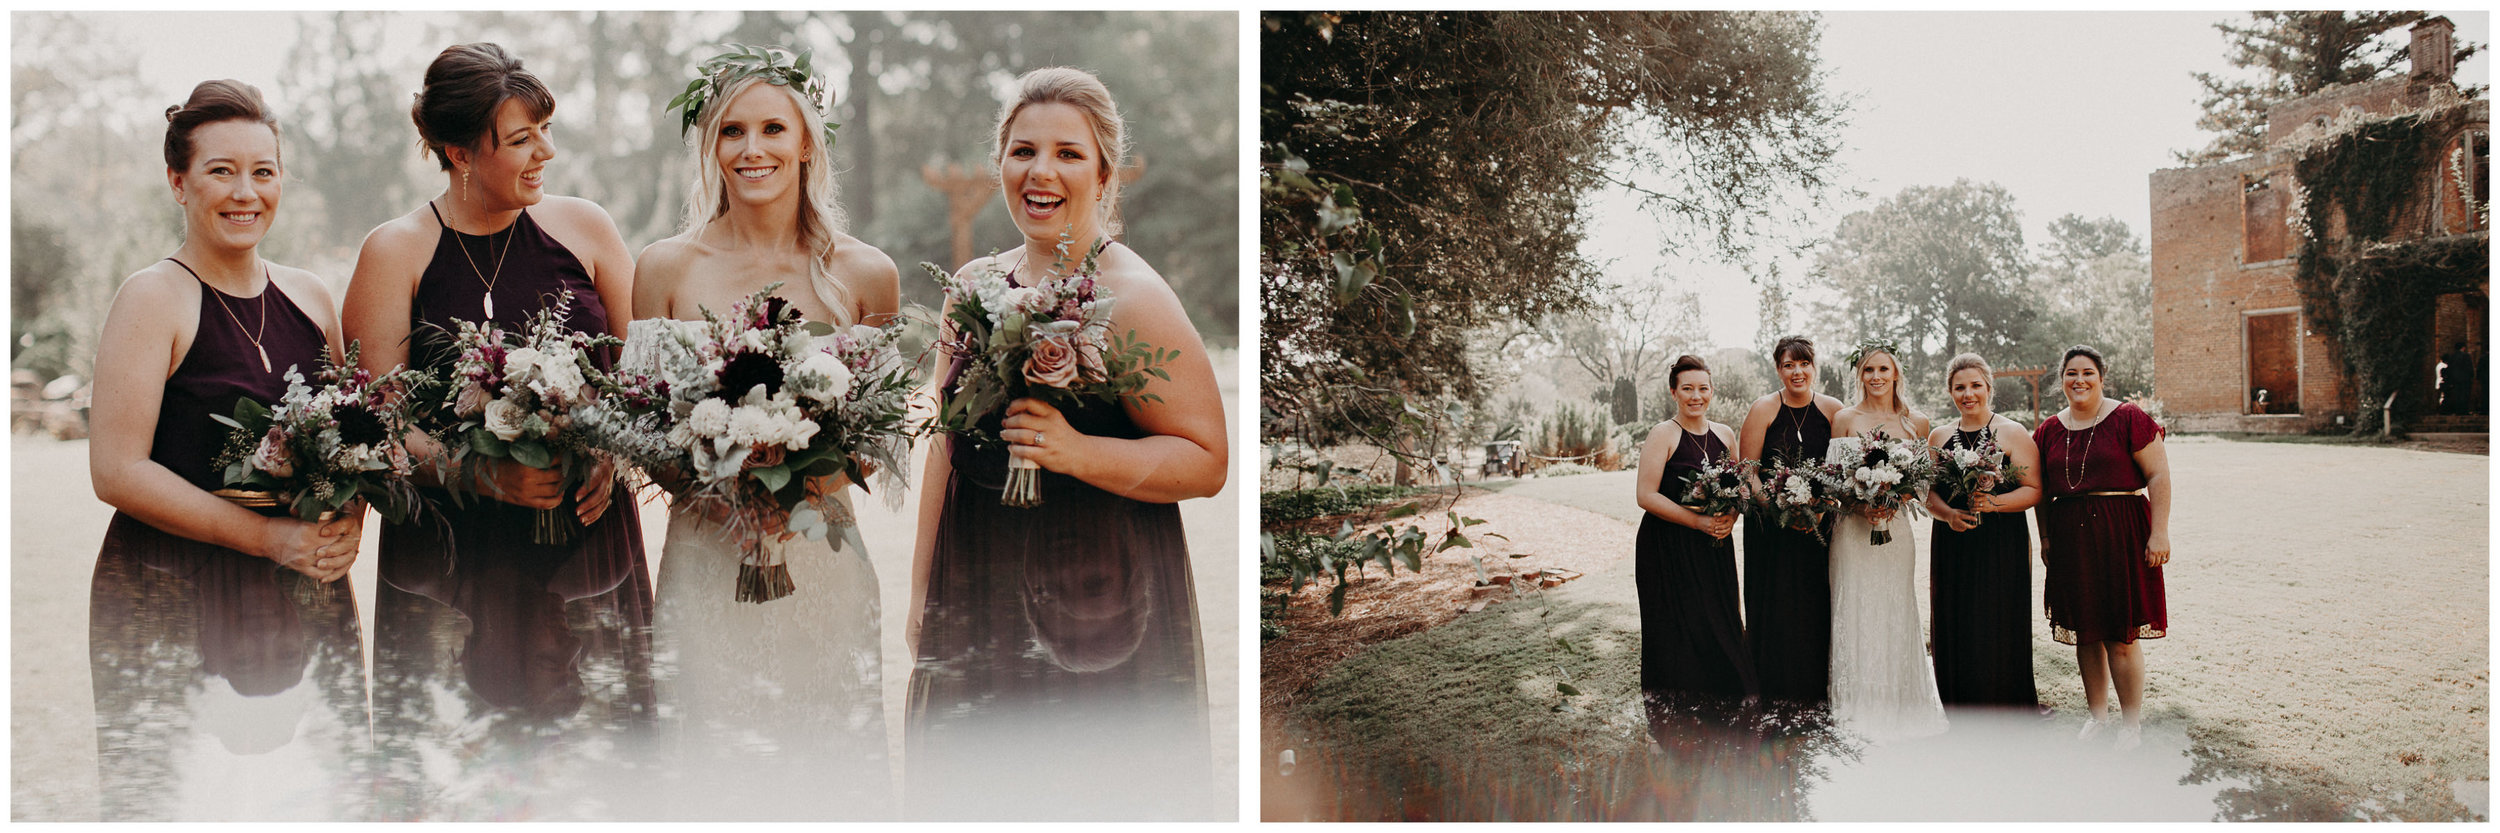 39 - Barnsley Gardens Wedding - Wedding Party portraits - First Look .jpg